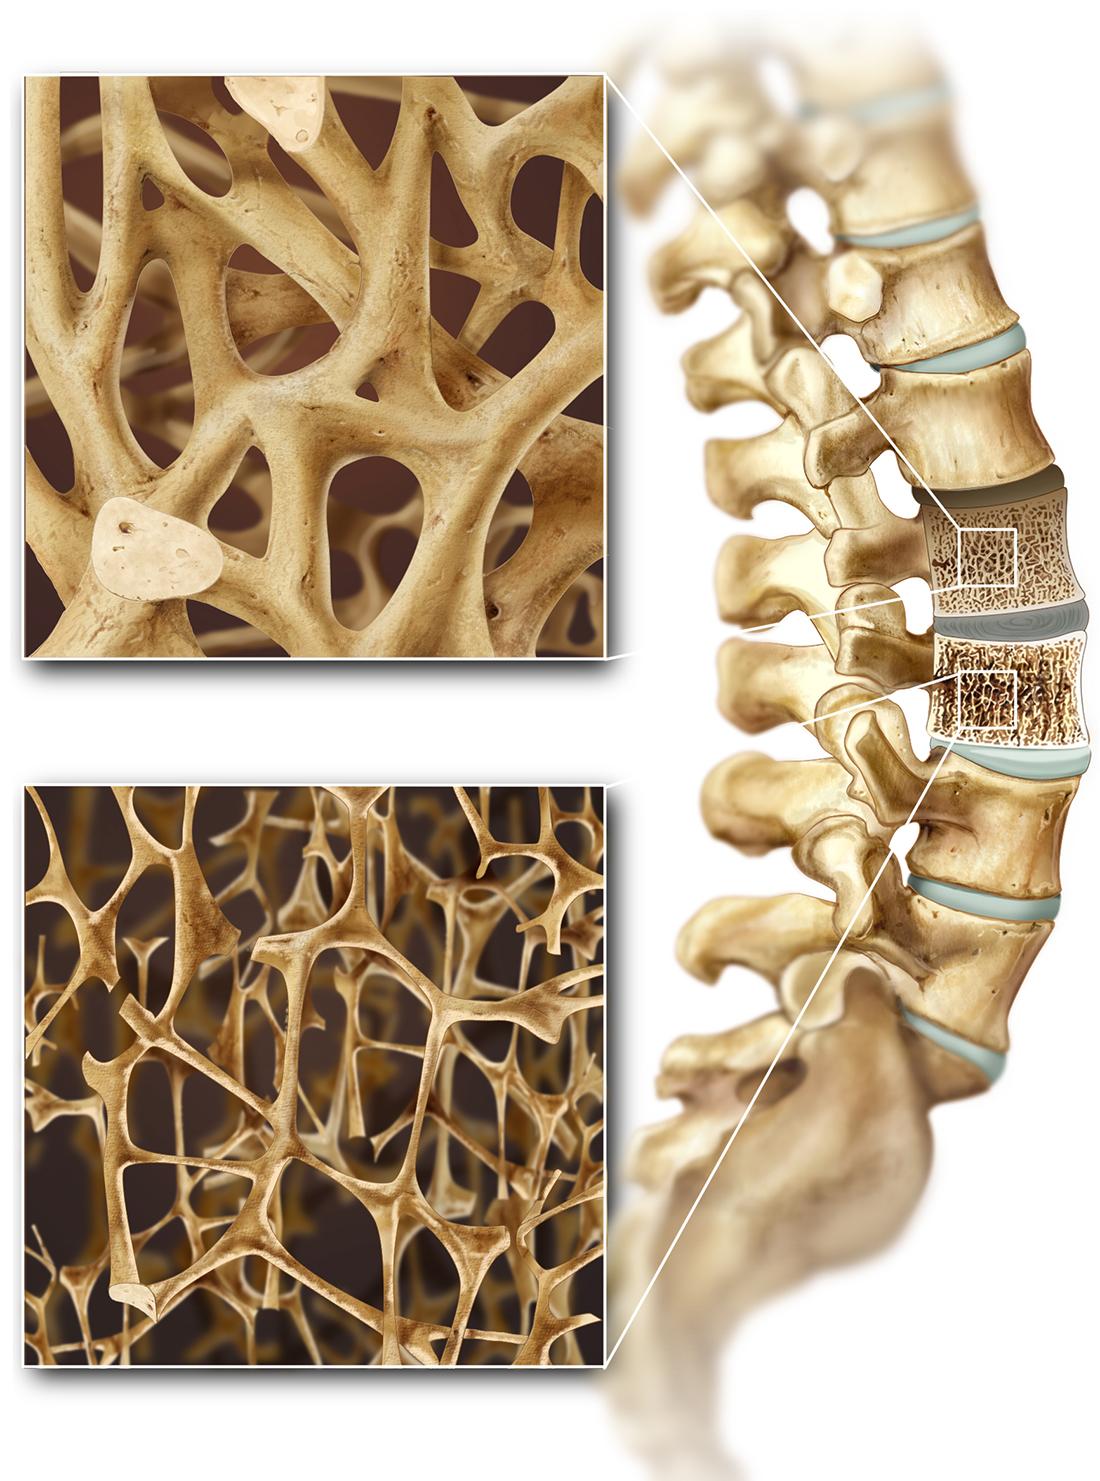 Osteoporosis vs healthy bone